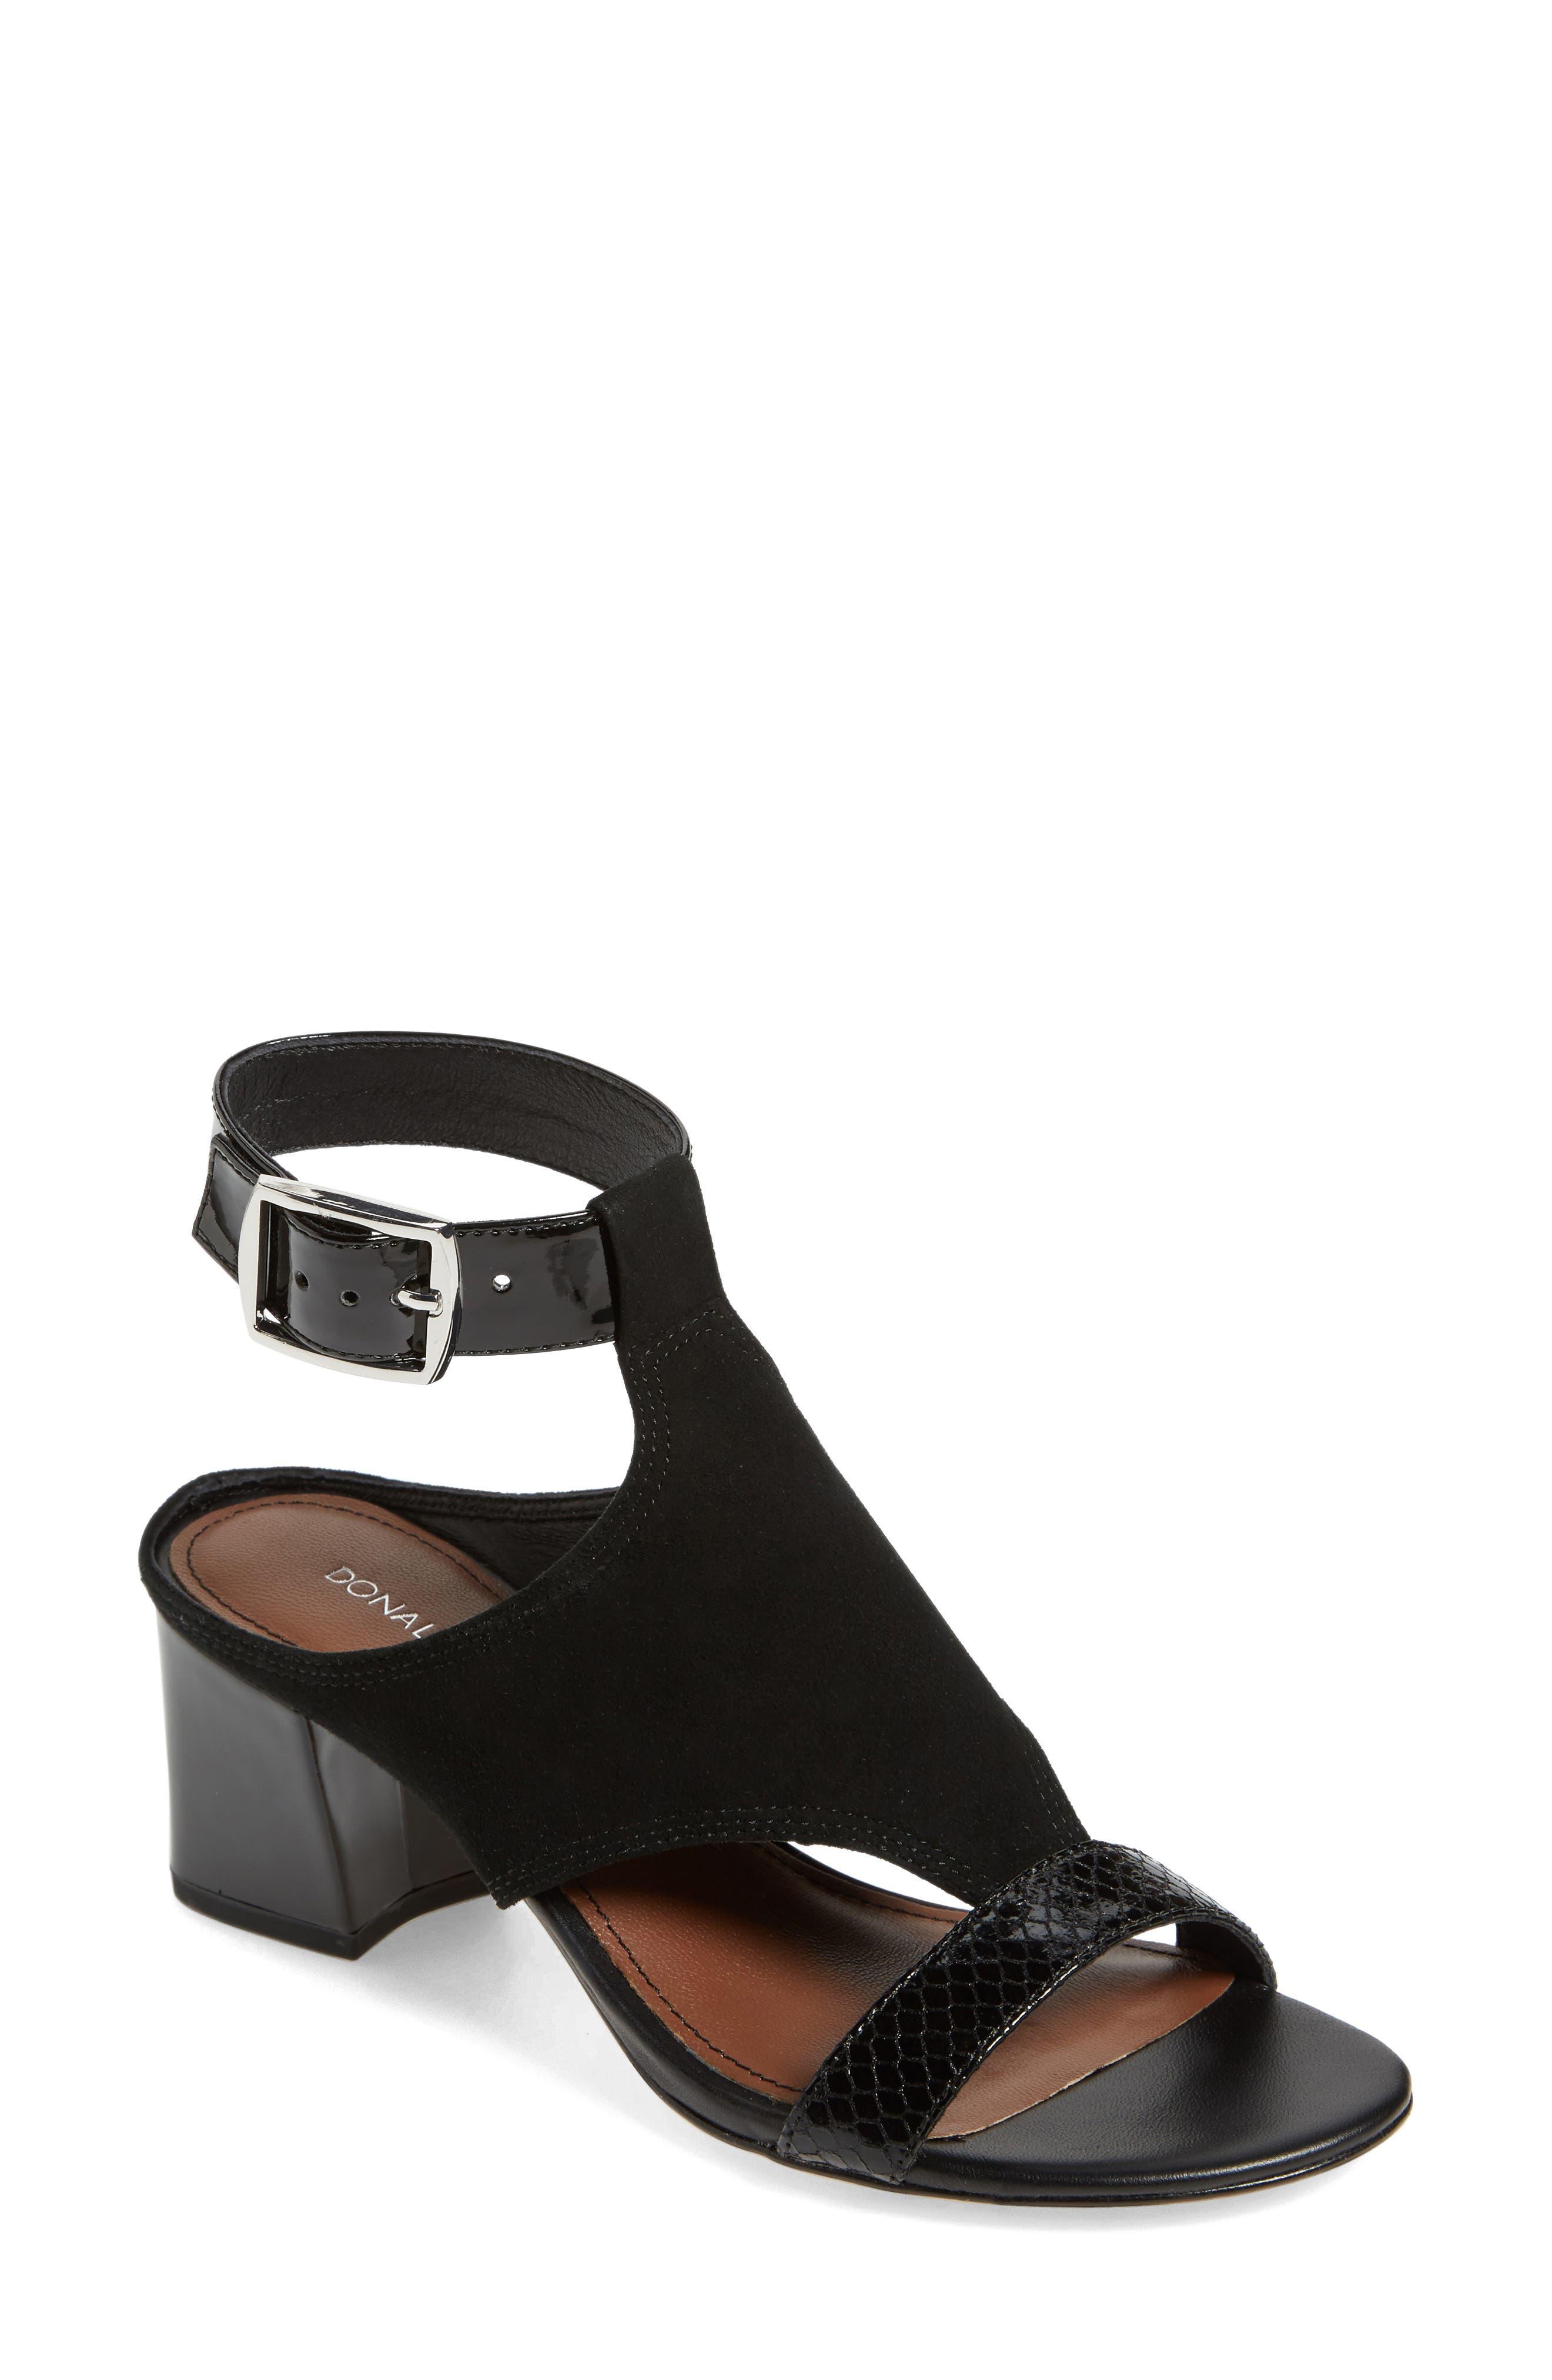 Donald J Pliner Ellee Block Heel Sandal,                         Main,                         color,